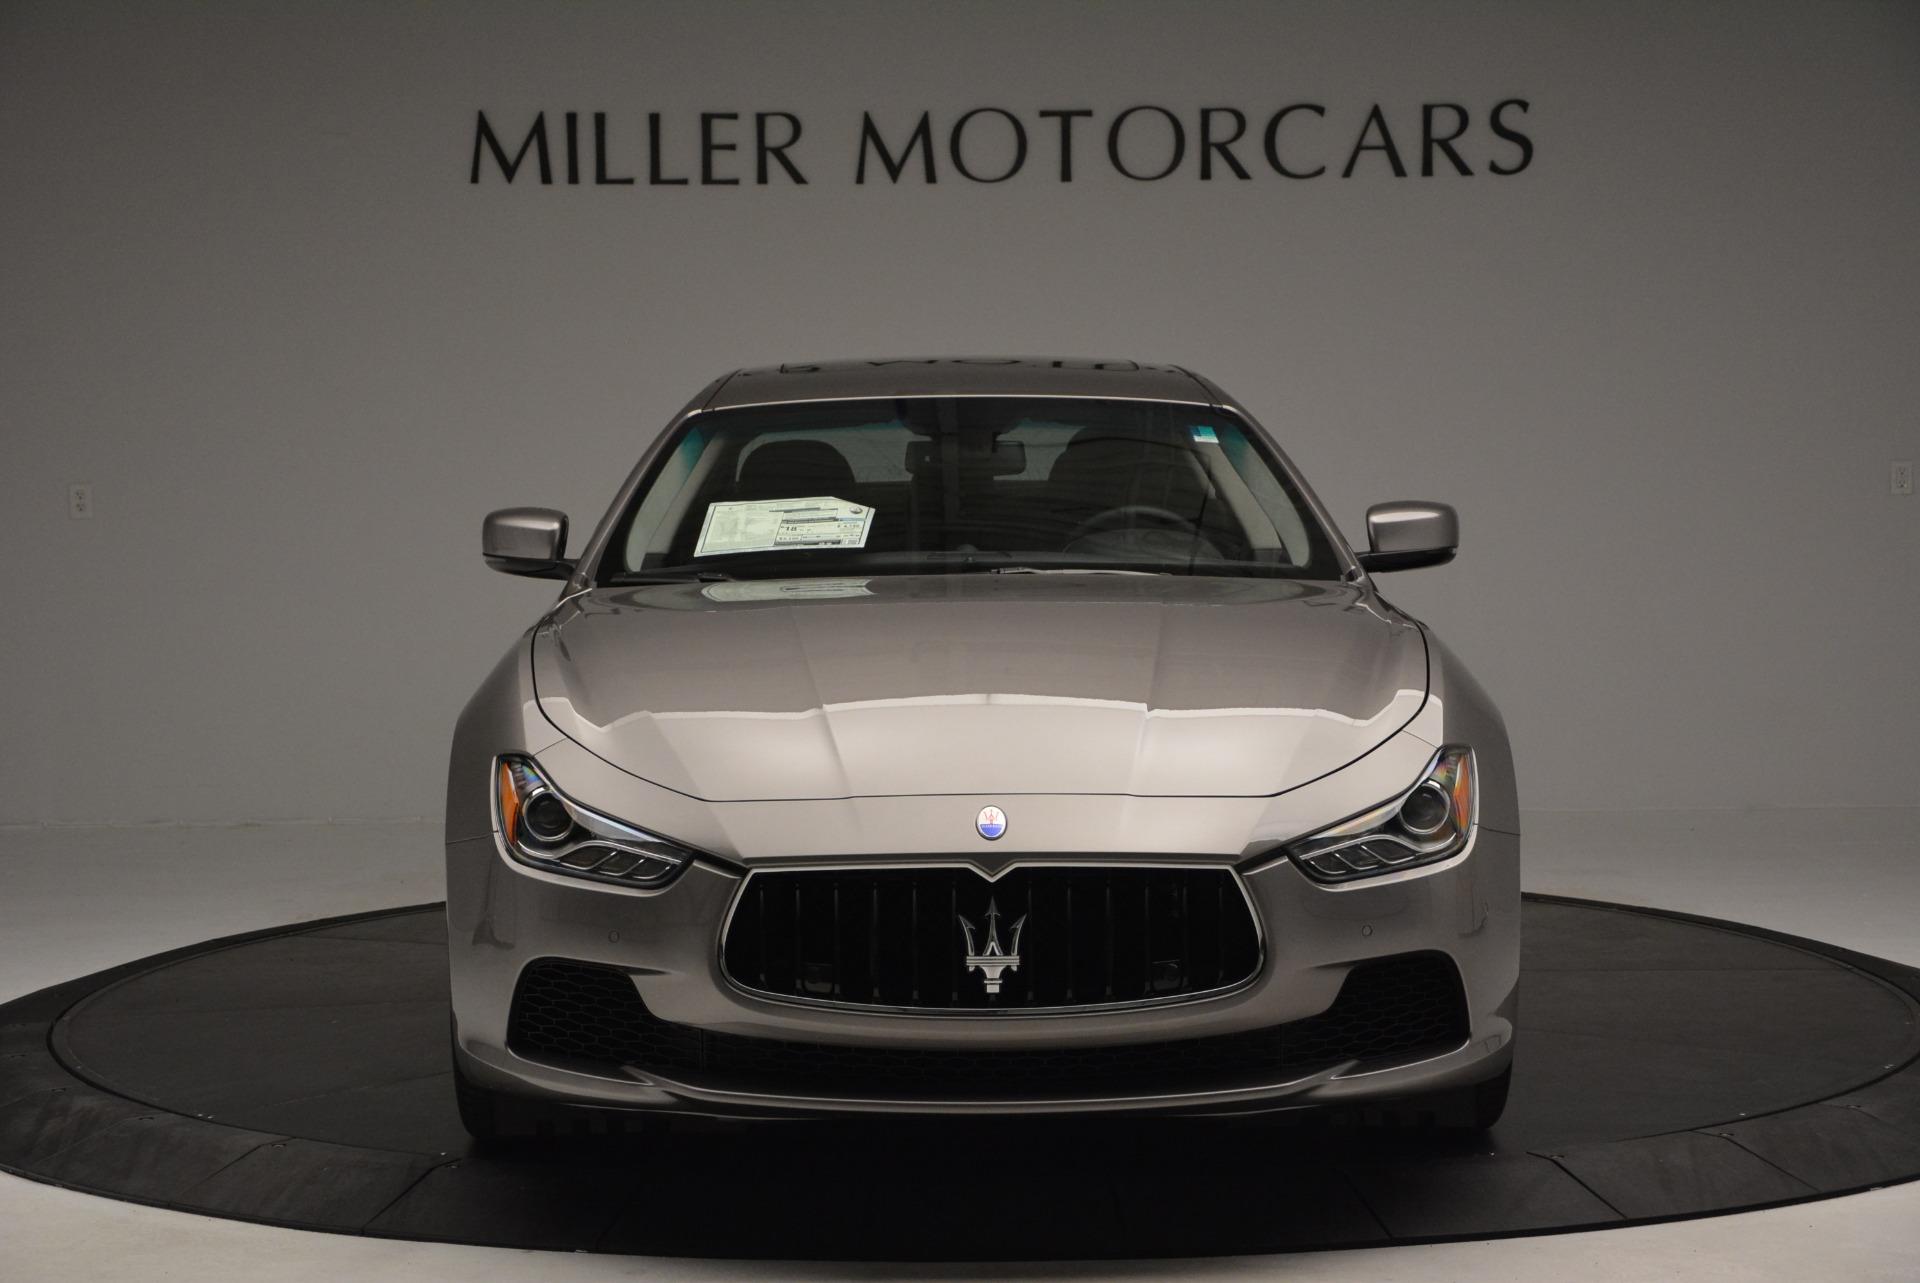 Used 2014 Maserati Ghibli S Q4 For Sale In Greenwich, CT 2562_p12